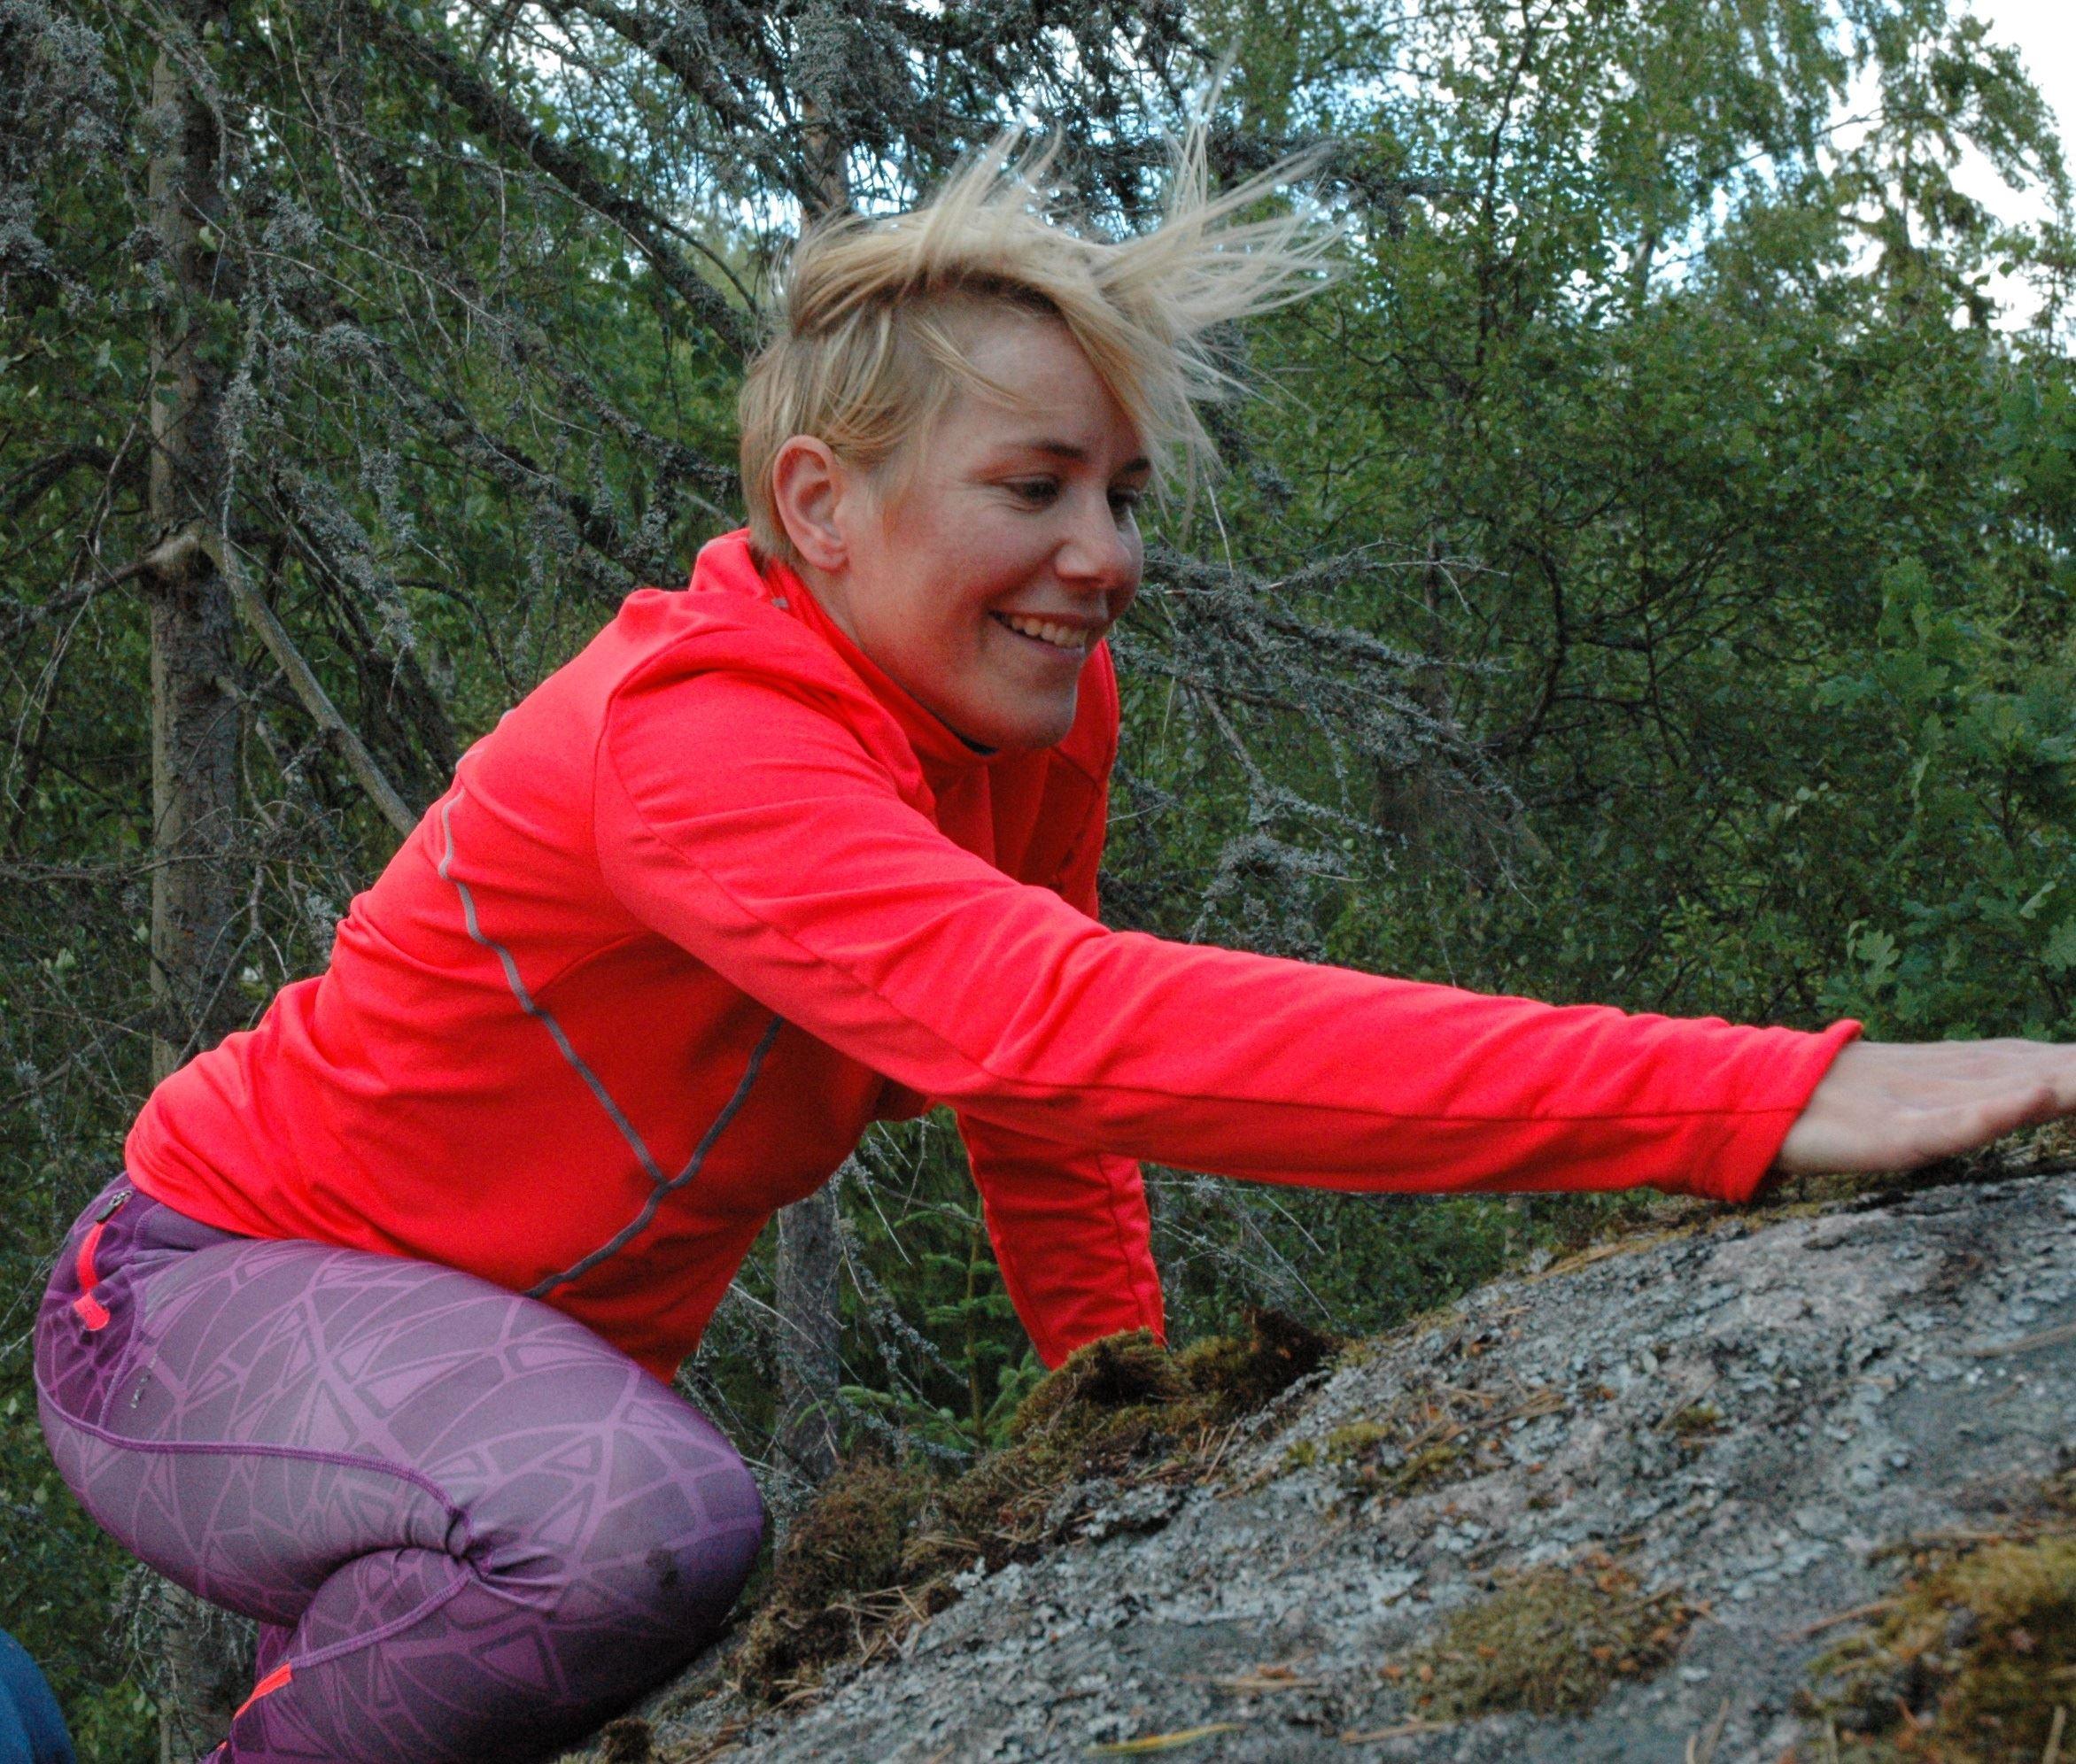 Climbing: Sundet